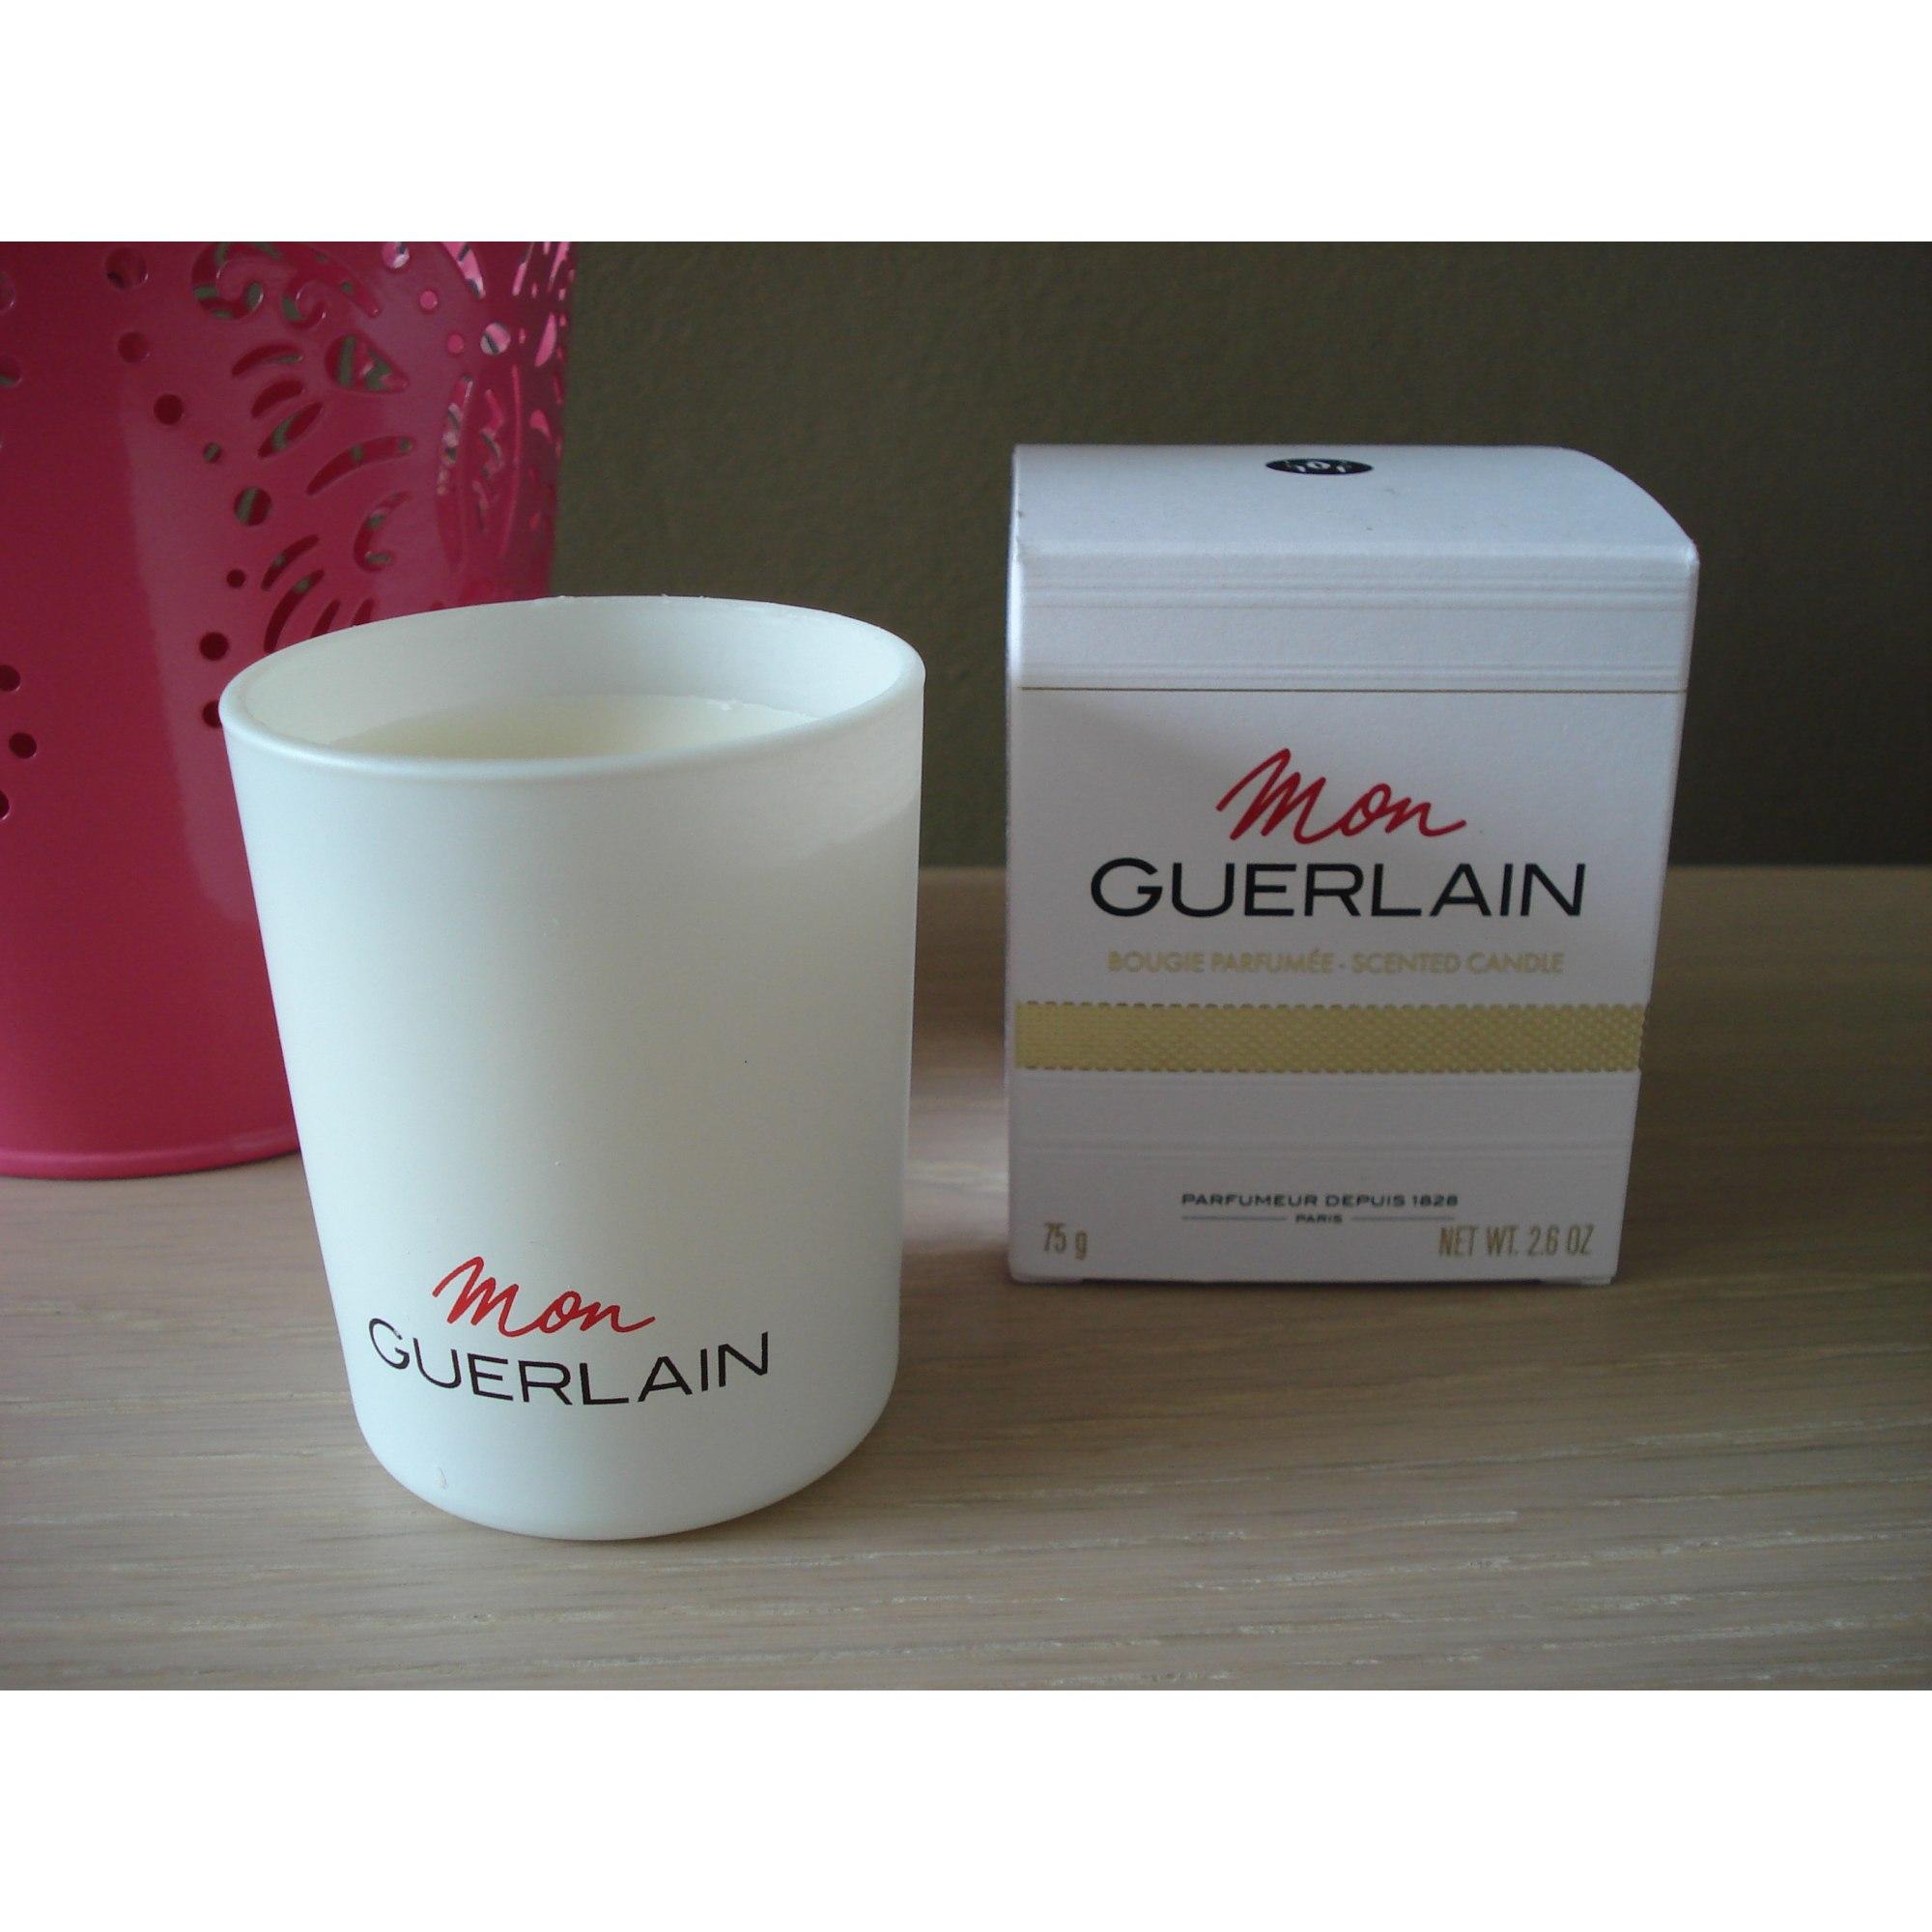 Bougie Guerlain Guerlain Parfumée Guerlain Parfumée Bougie Parfumée Bougie jqAL3R45